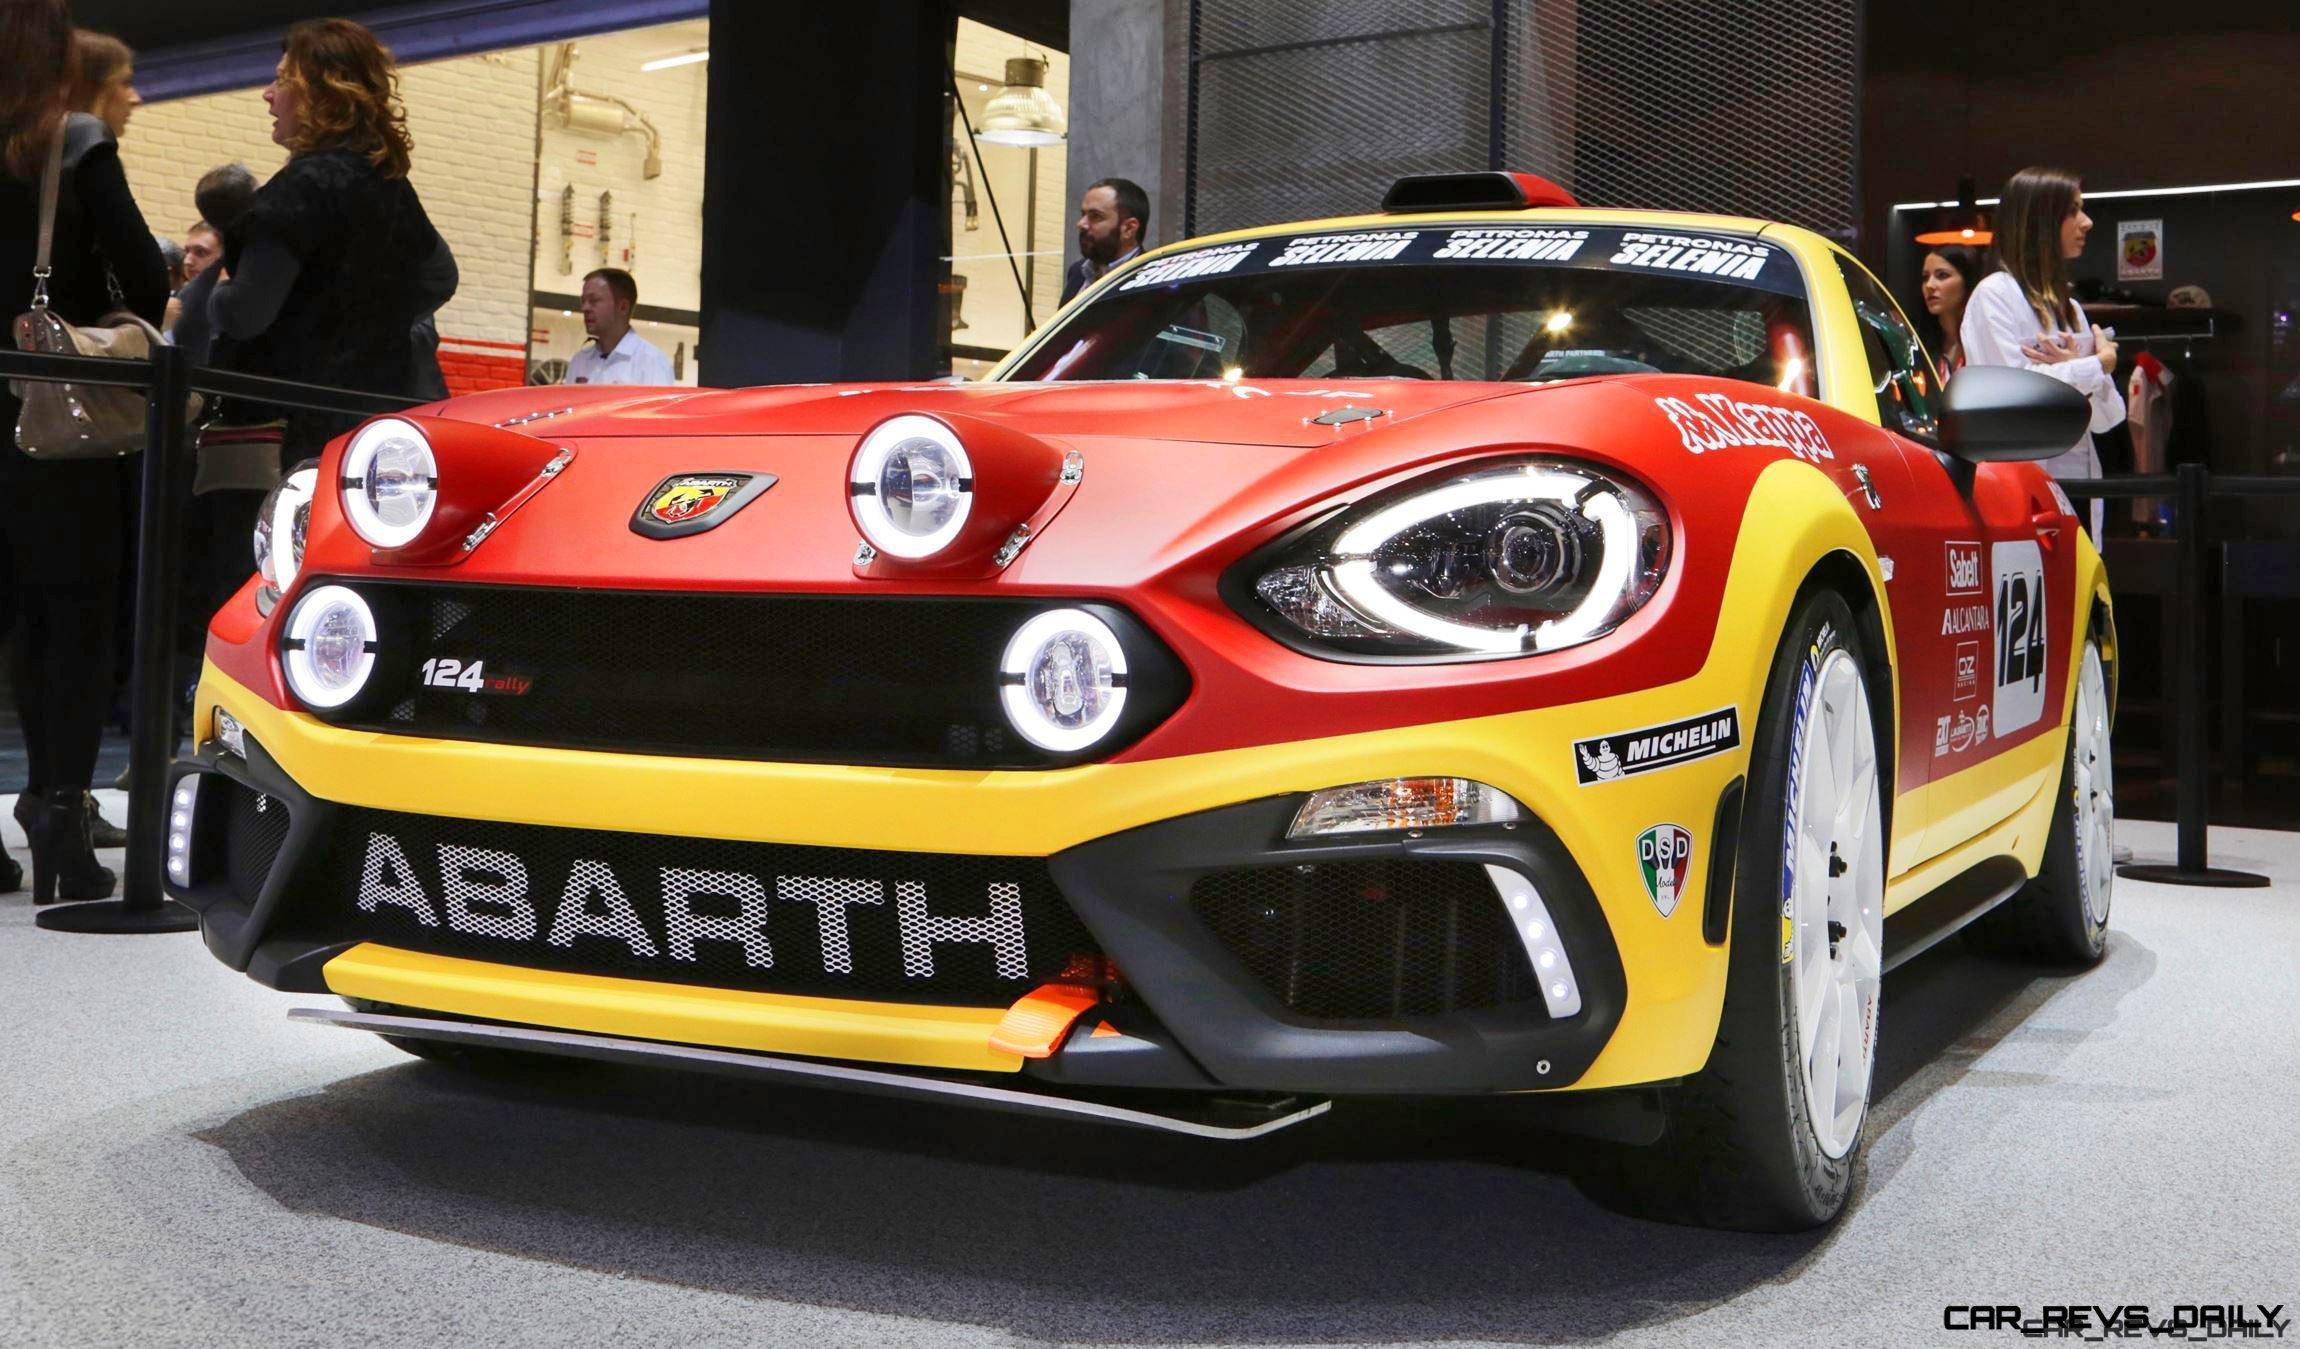 2016 Abarth 124 Rally Prototype 5